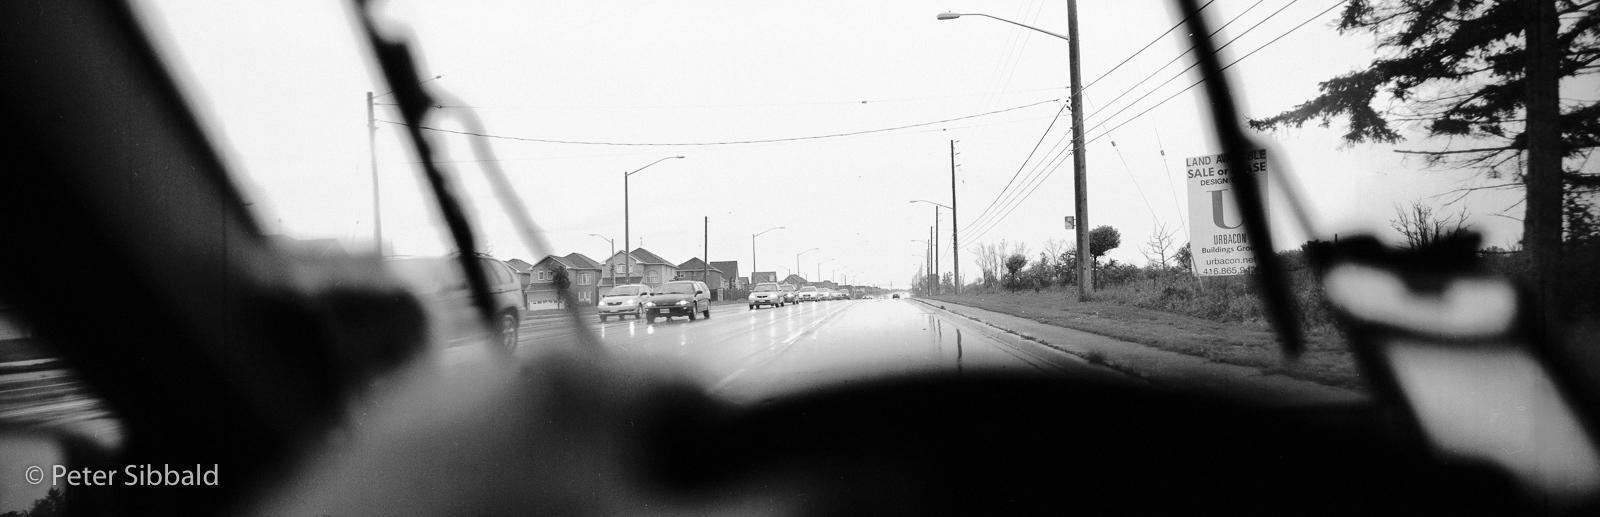 Art and Documentary Photography - Loading 011-2005_spr_204_5.jpg